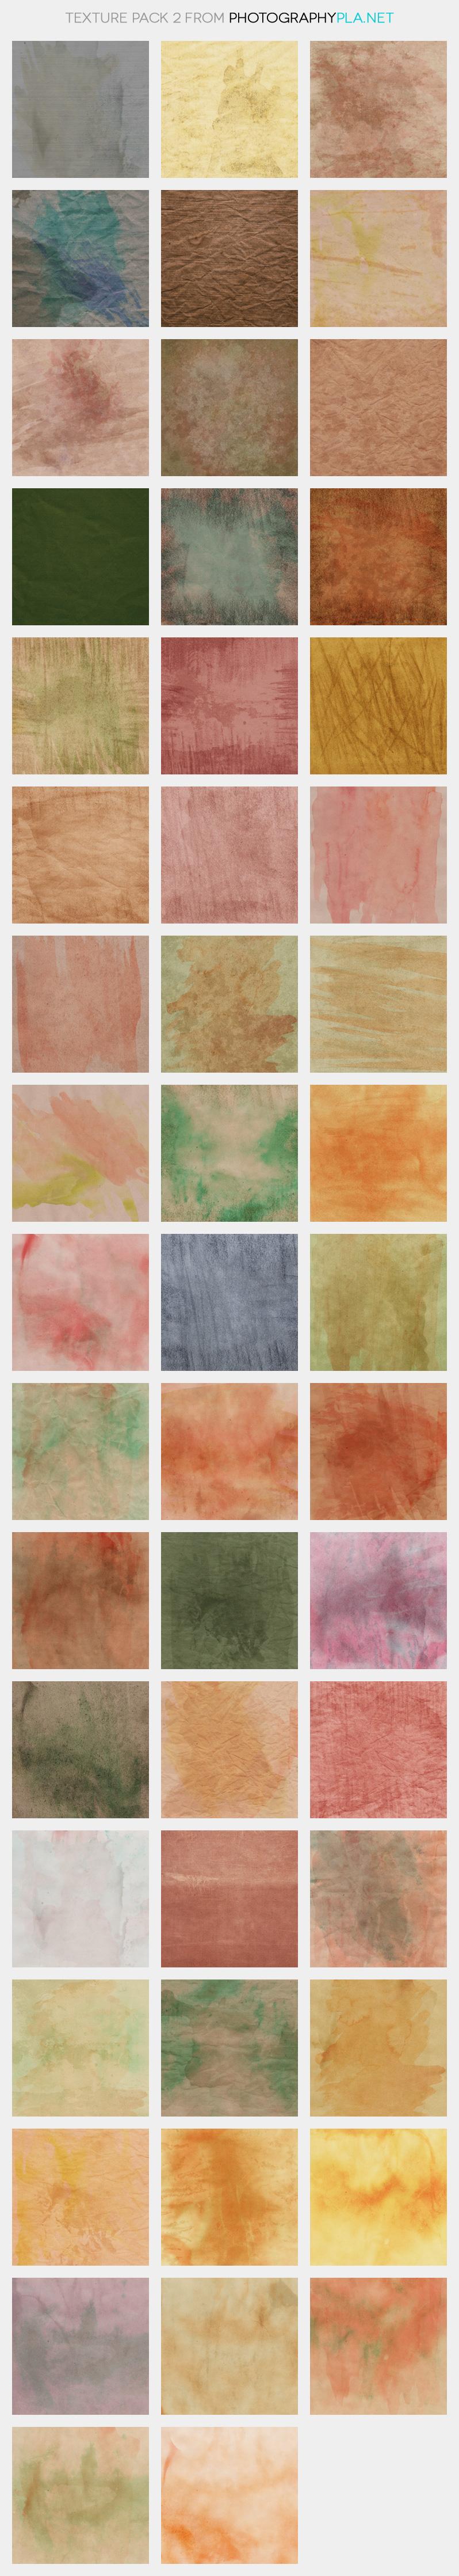 PhotographyPla.net Texture Pack 2